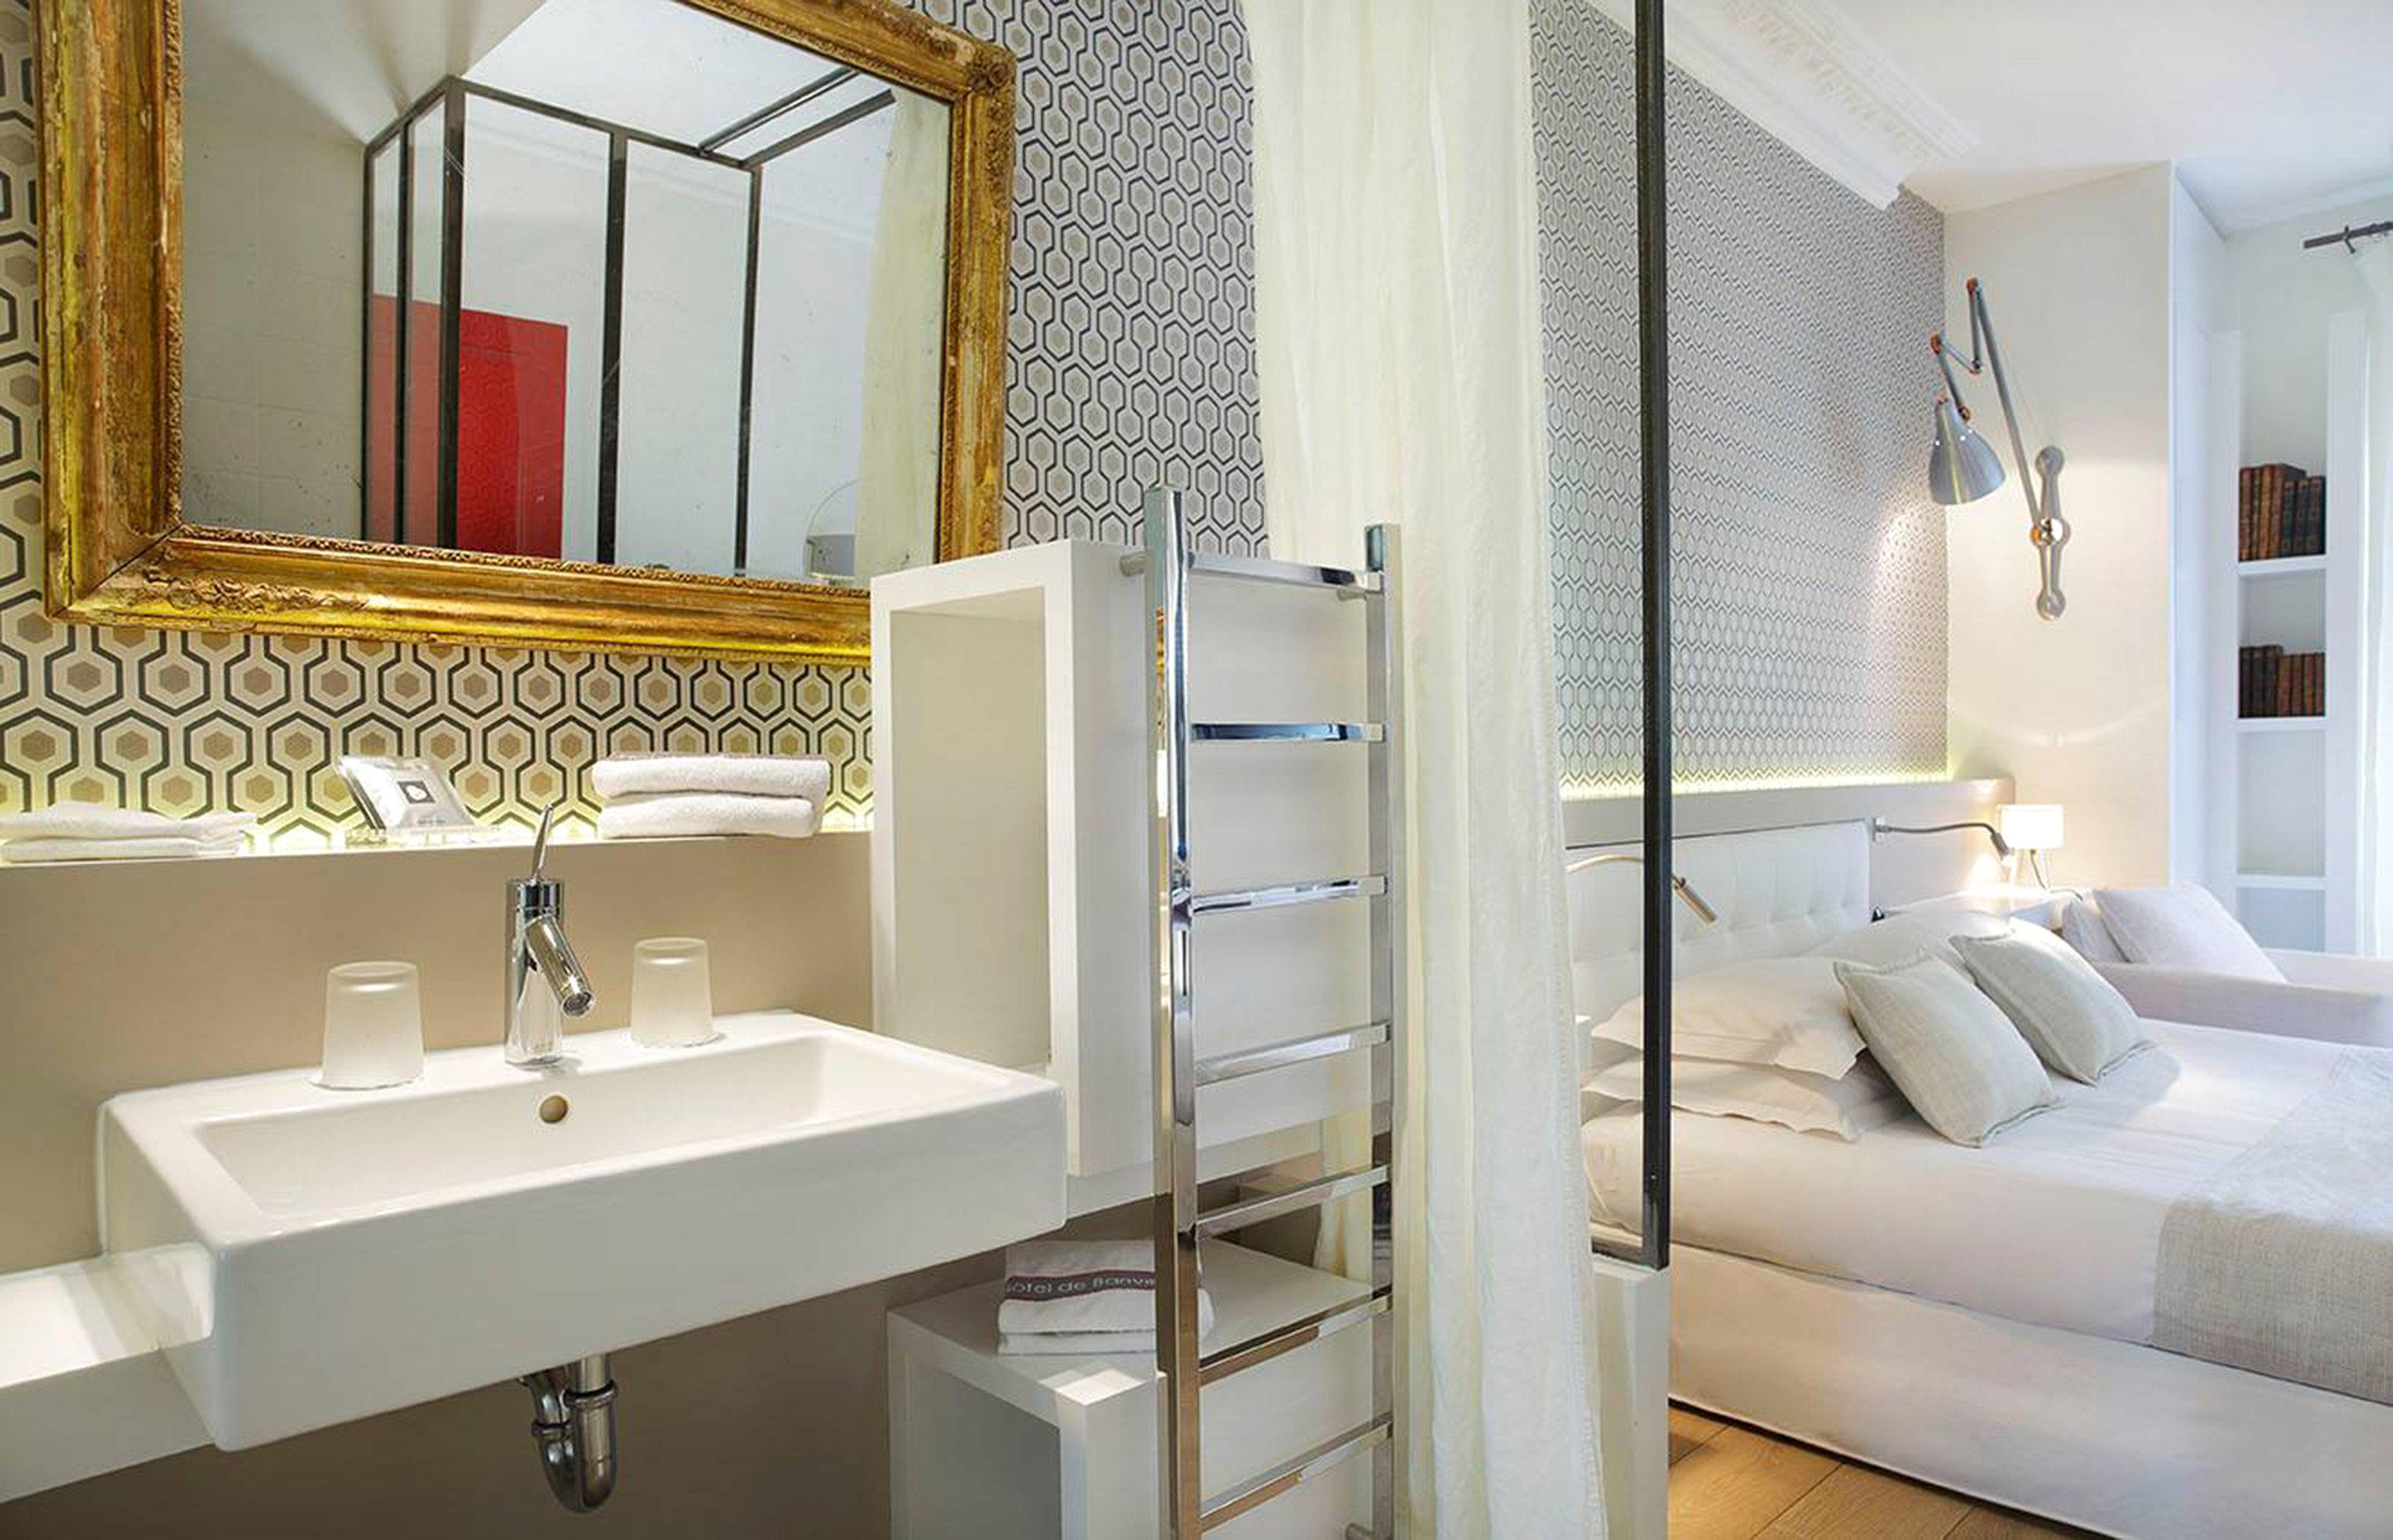 Bedroom Elegant Luxury Modern Suite bathroom mirror property sink home white plumbing fixture bathtub tub Bath